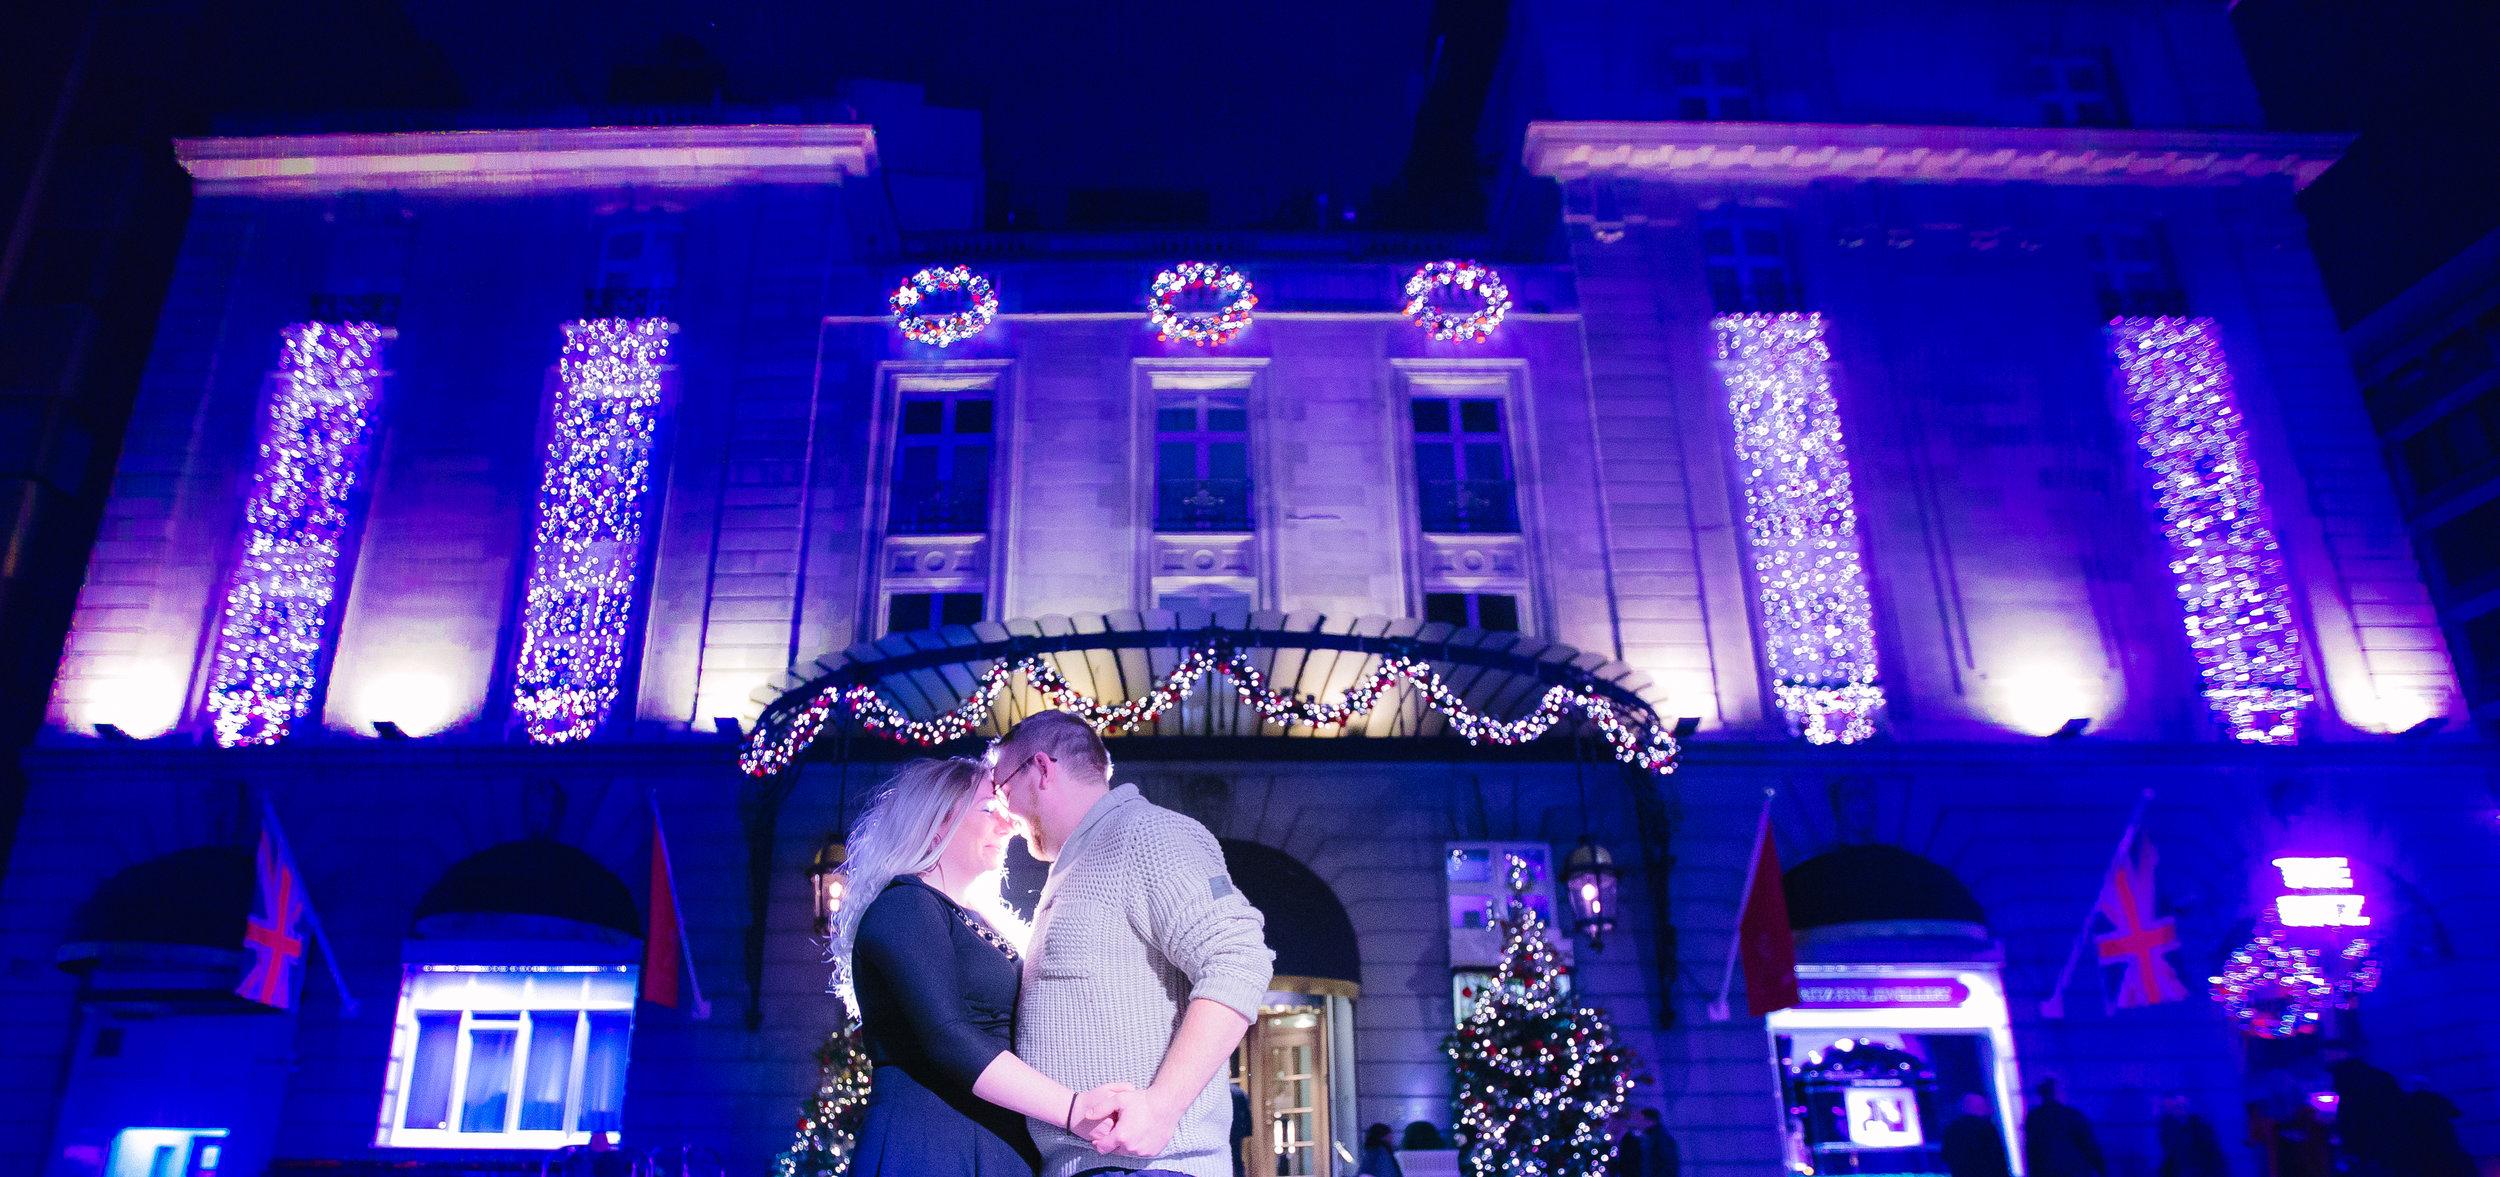 london-oxford-street-christmas-lights-engagement-wedding-photography-04